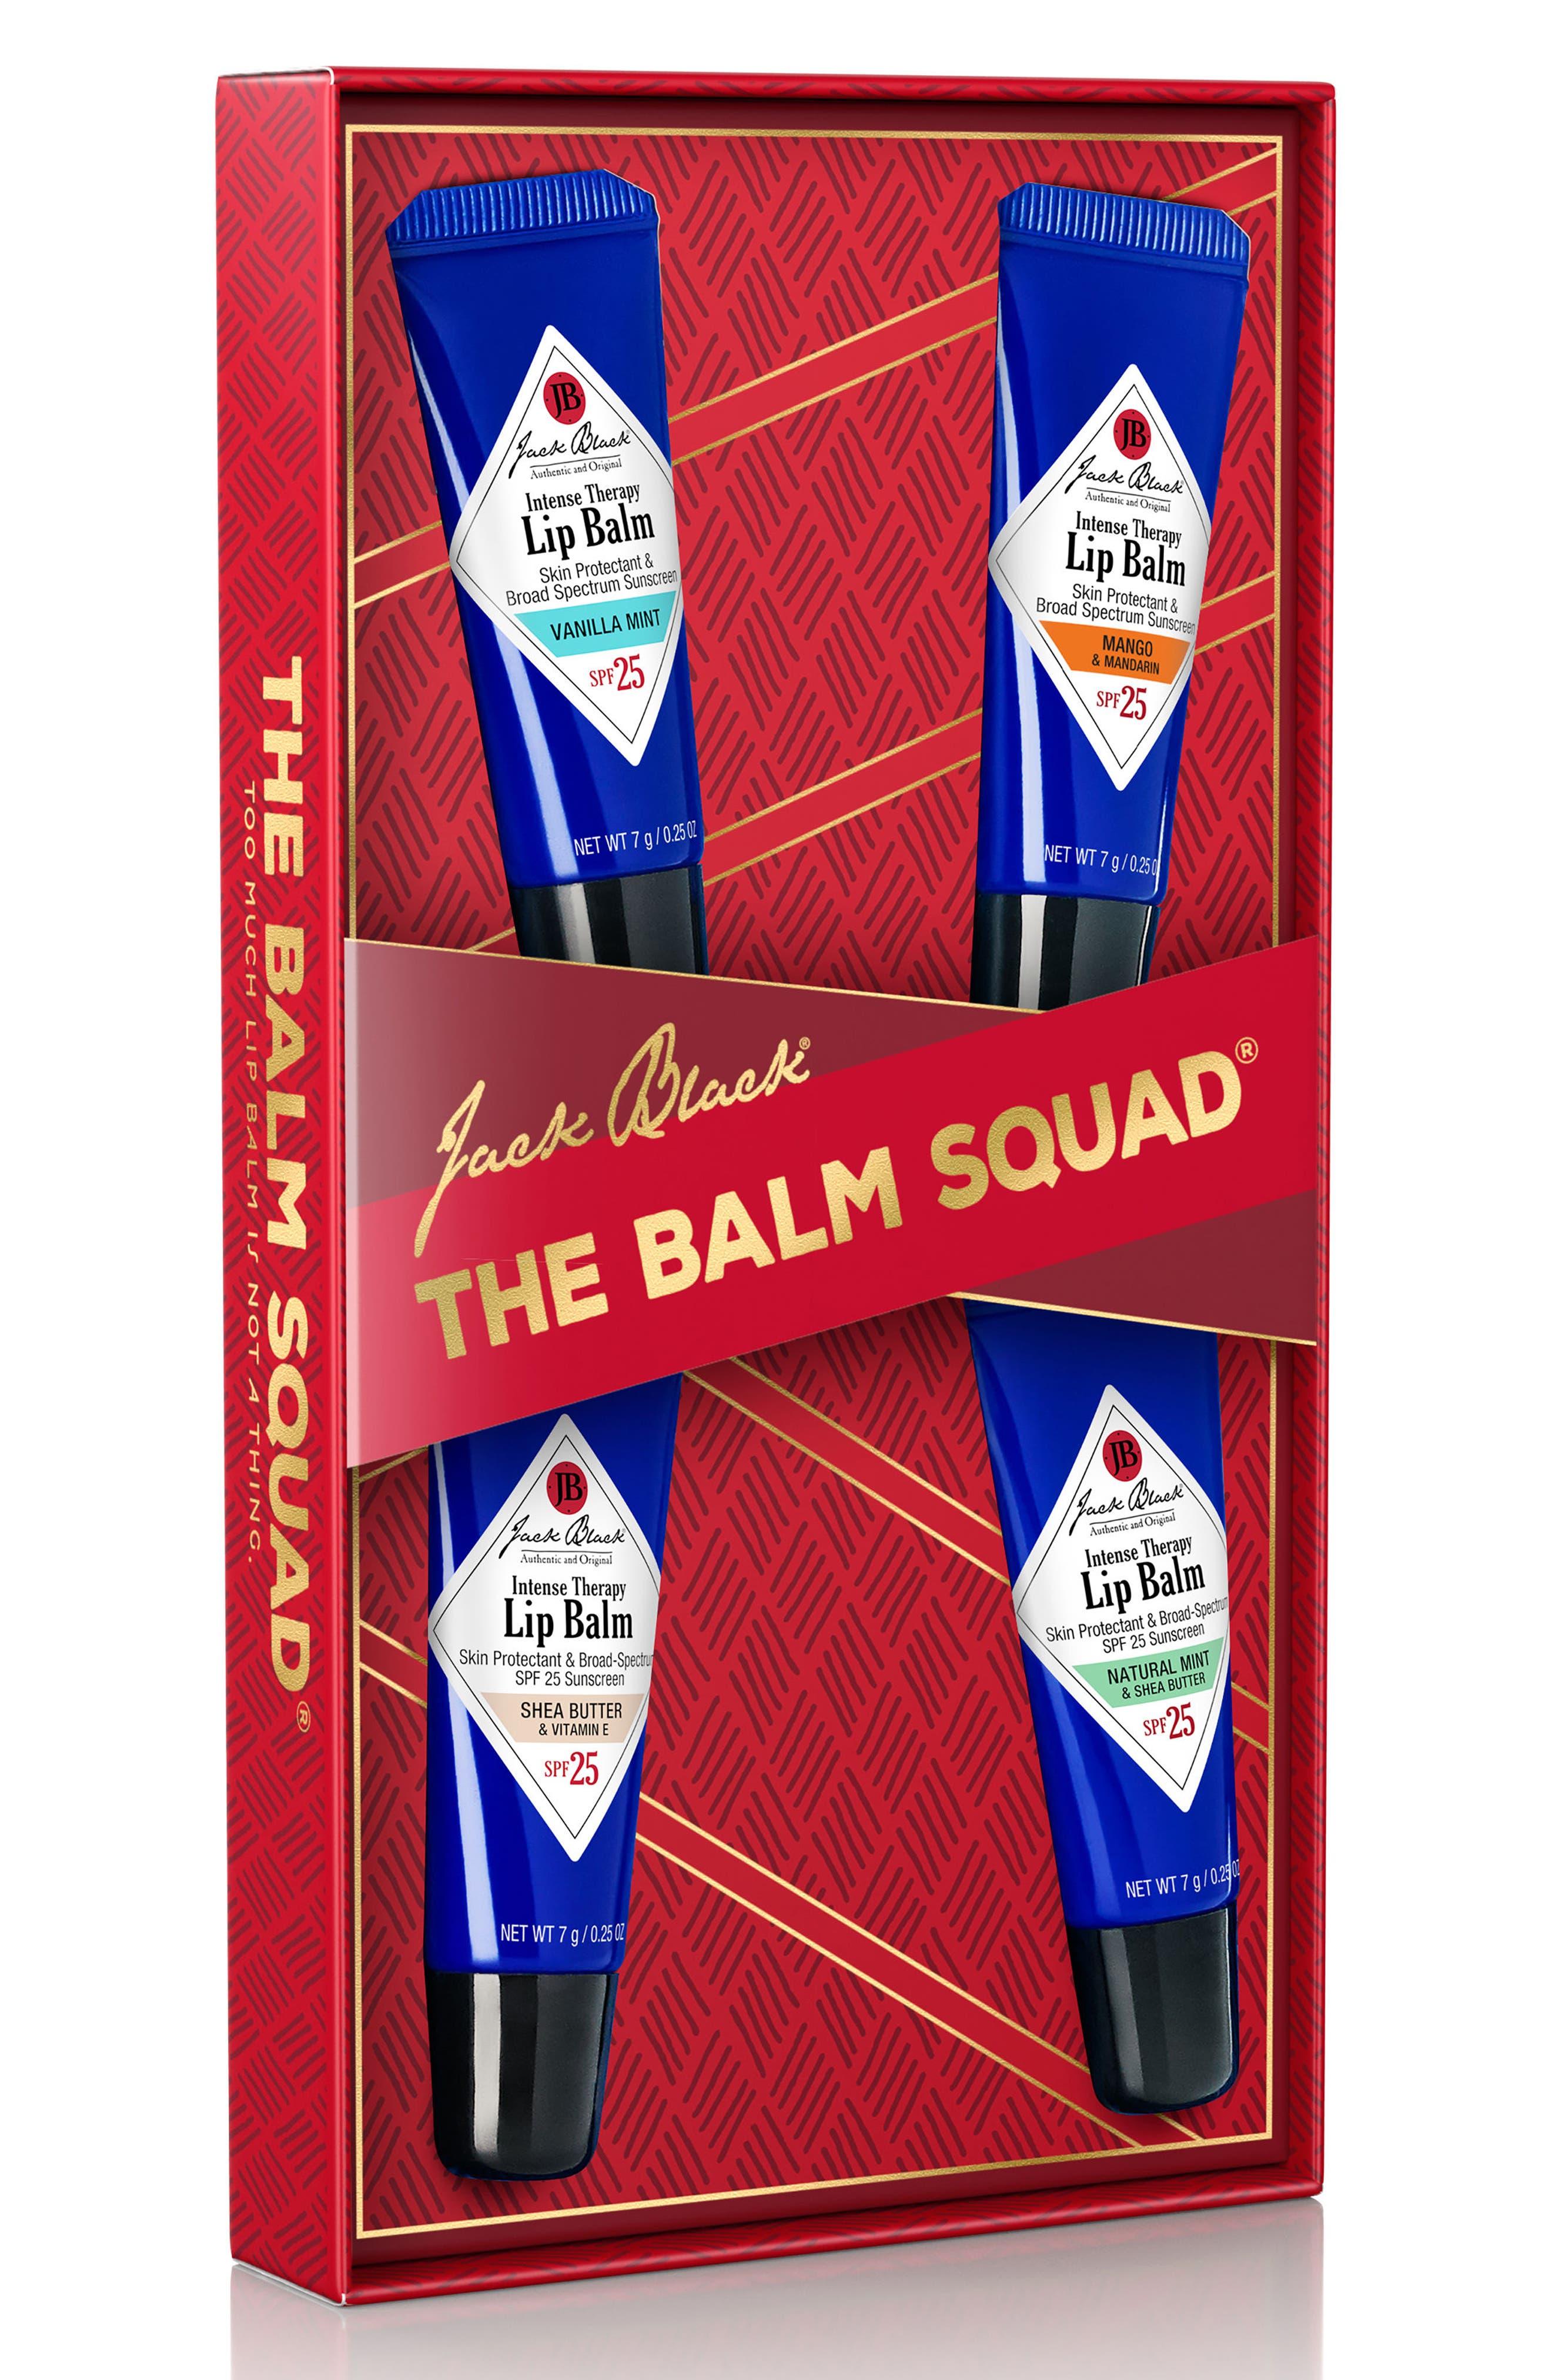 The Balm Squad Set,                             Alternate thumbnail 3, color,                             000